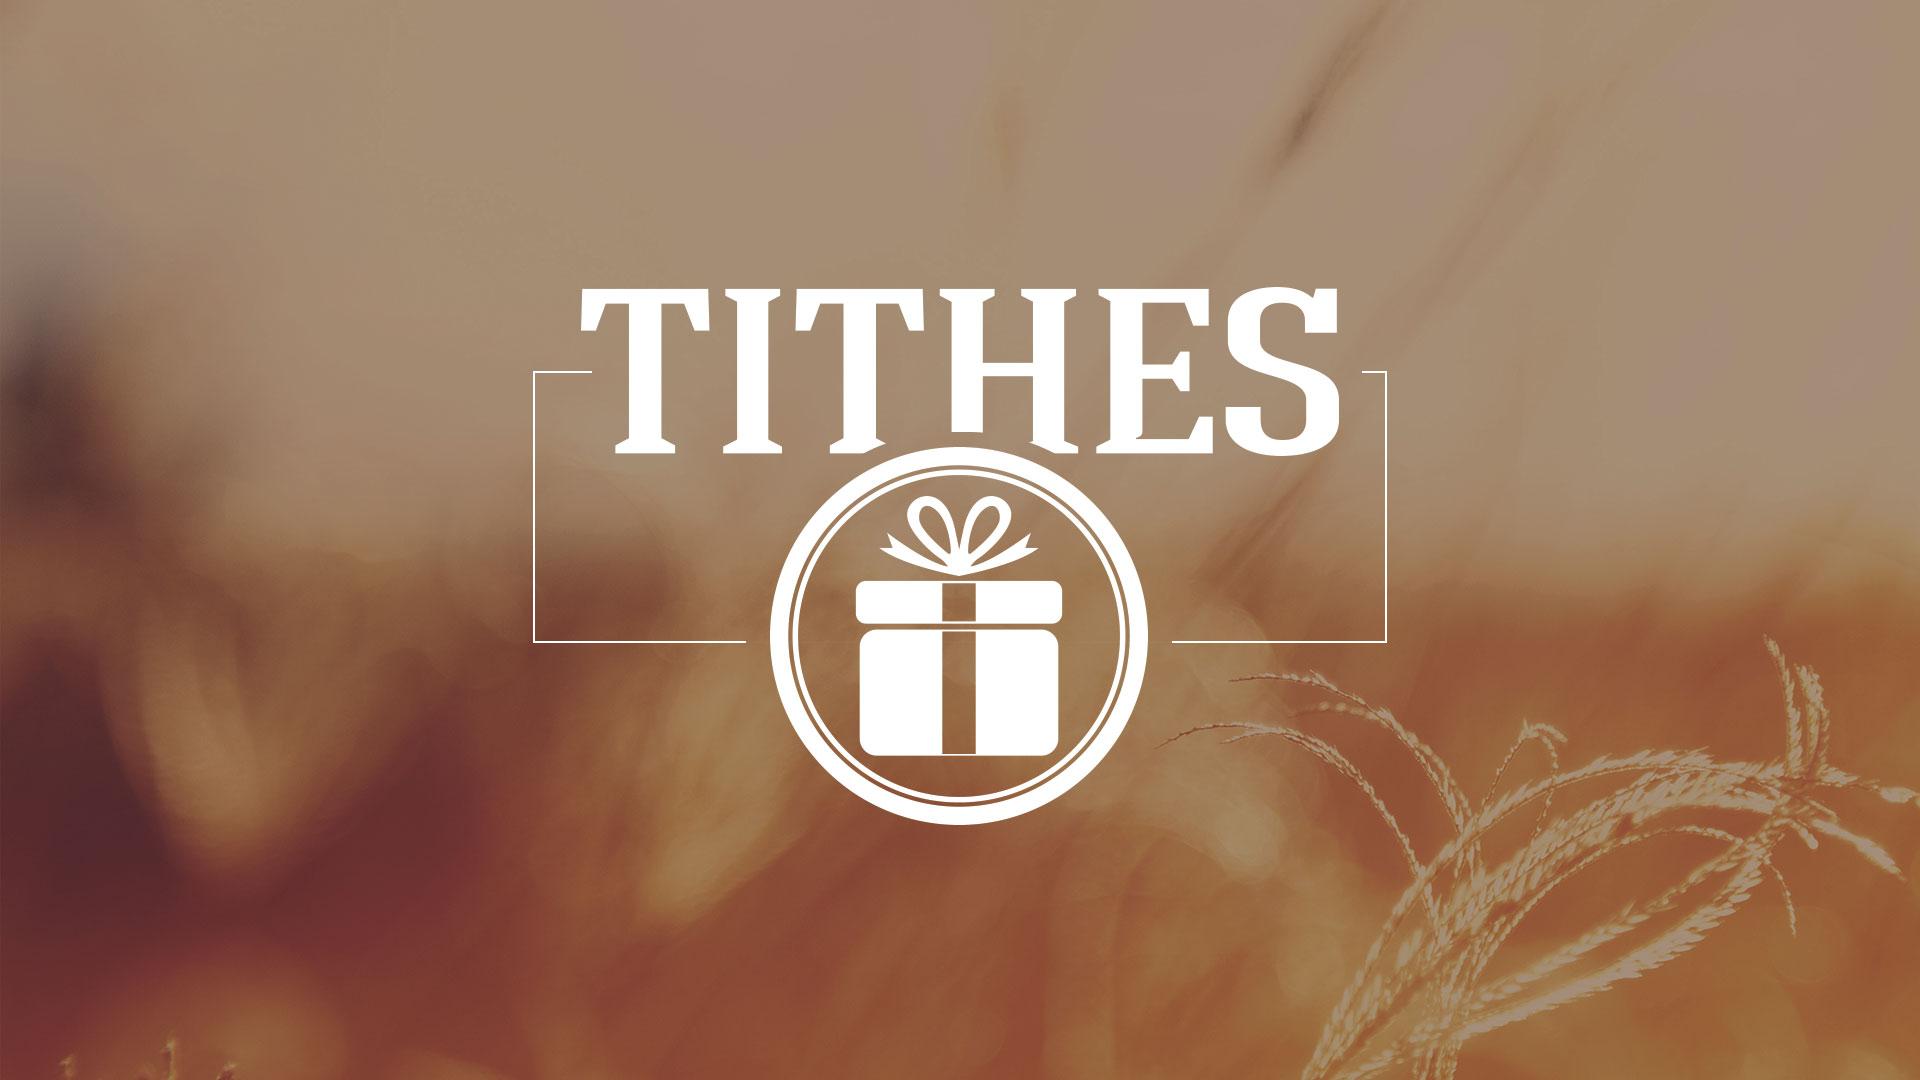 tithes